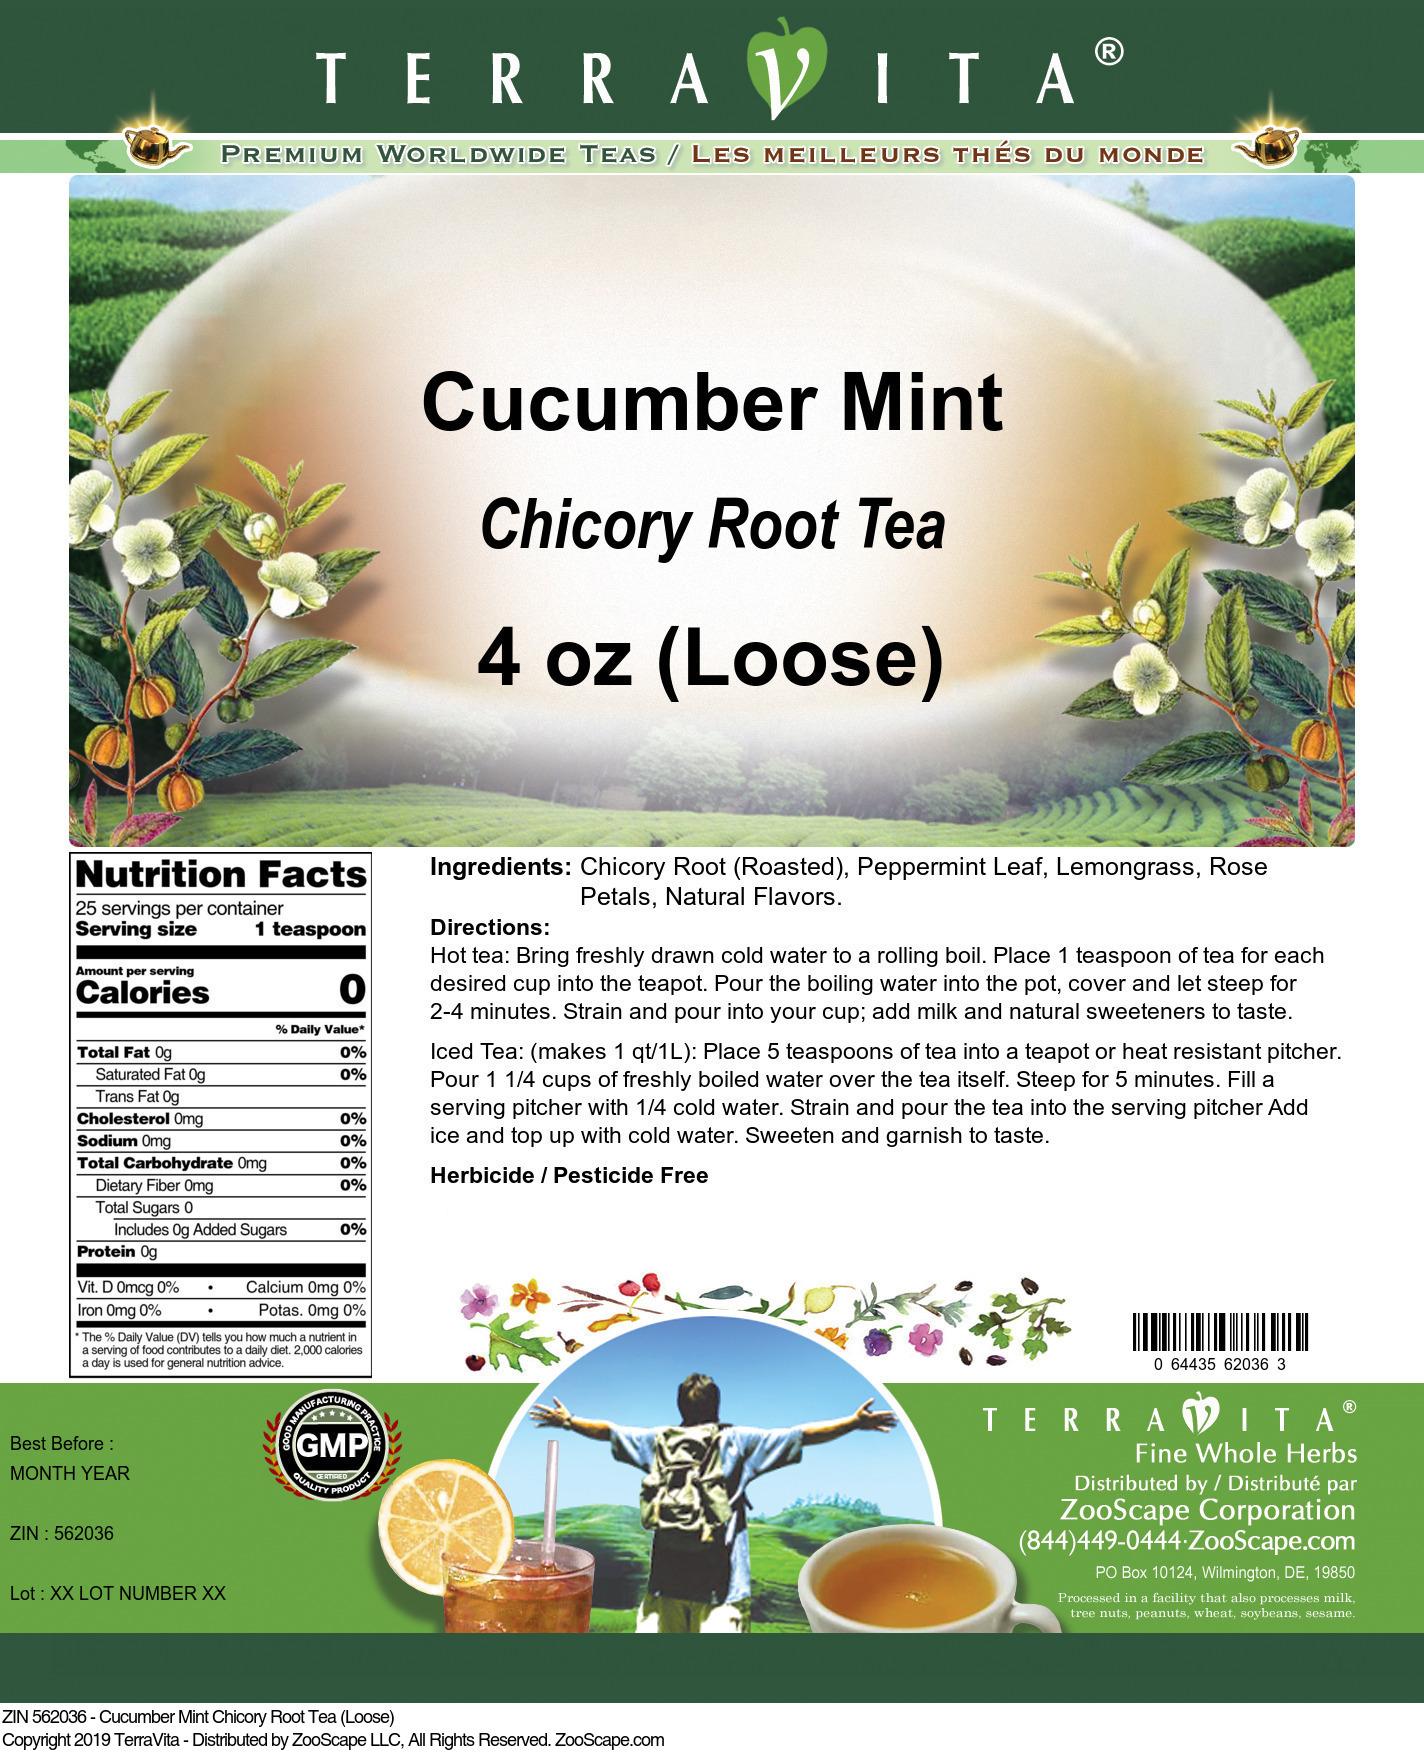 Cucumber Mint Chicory Root Tea (Loose)